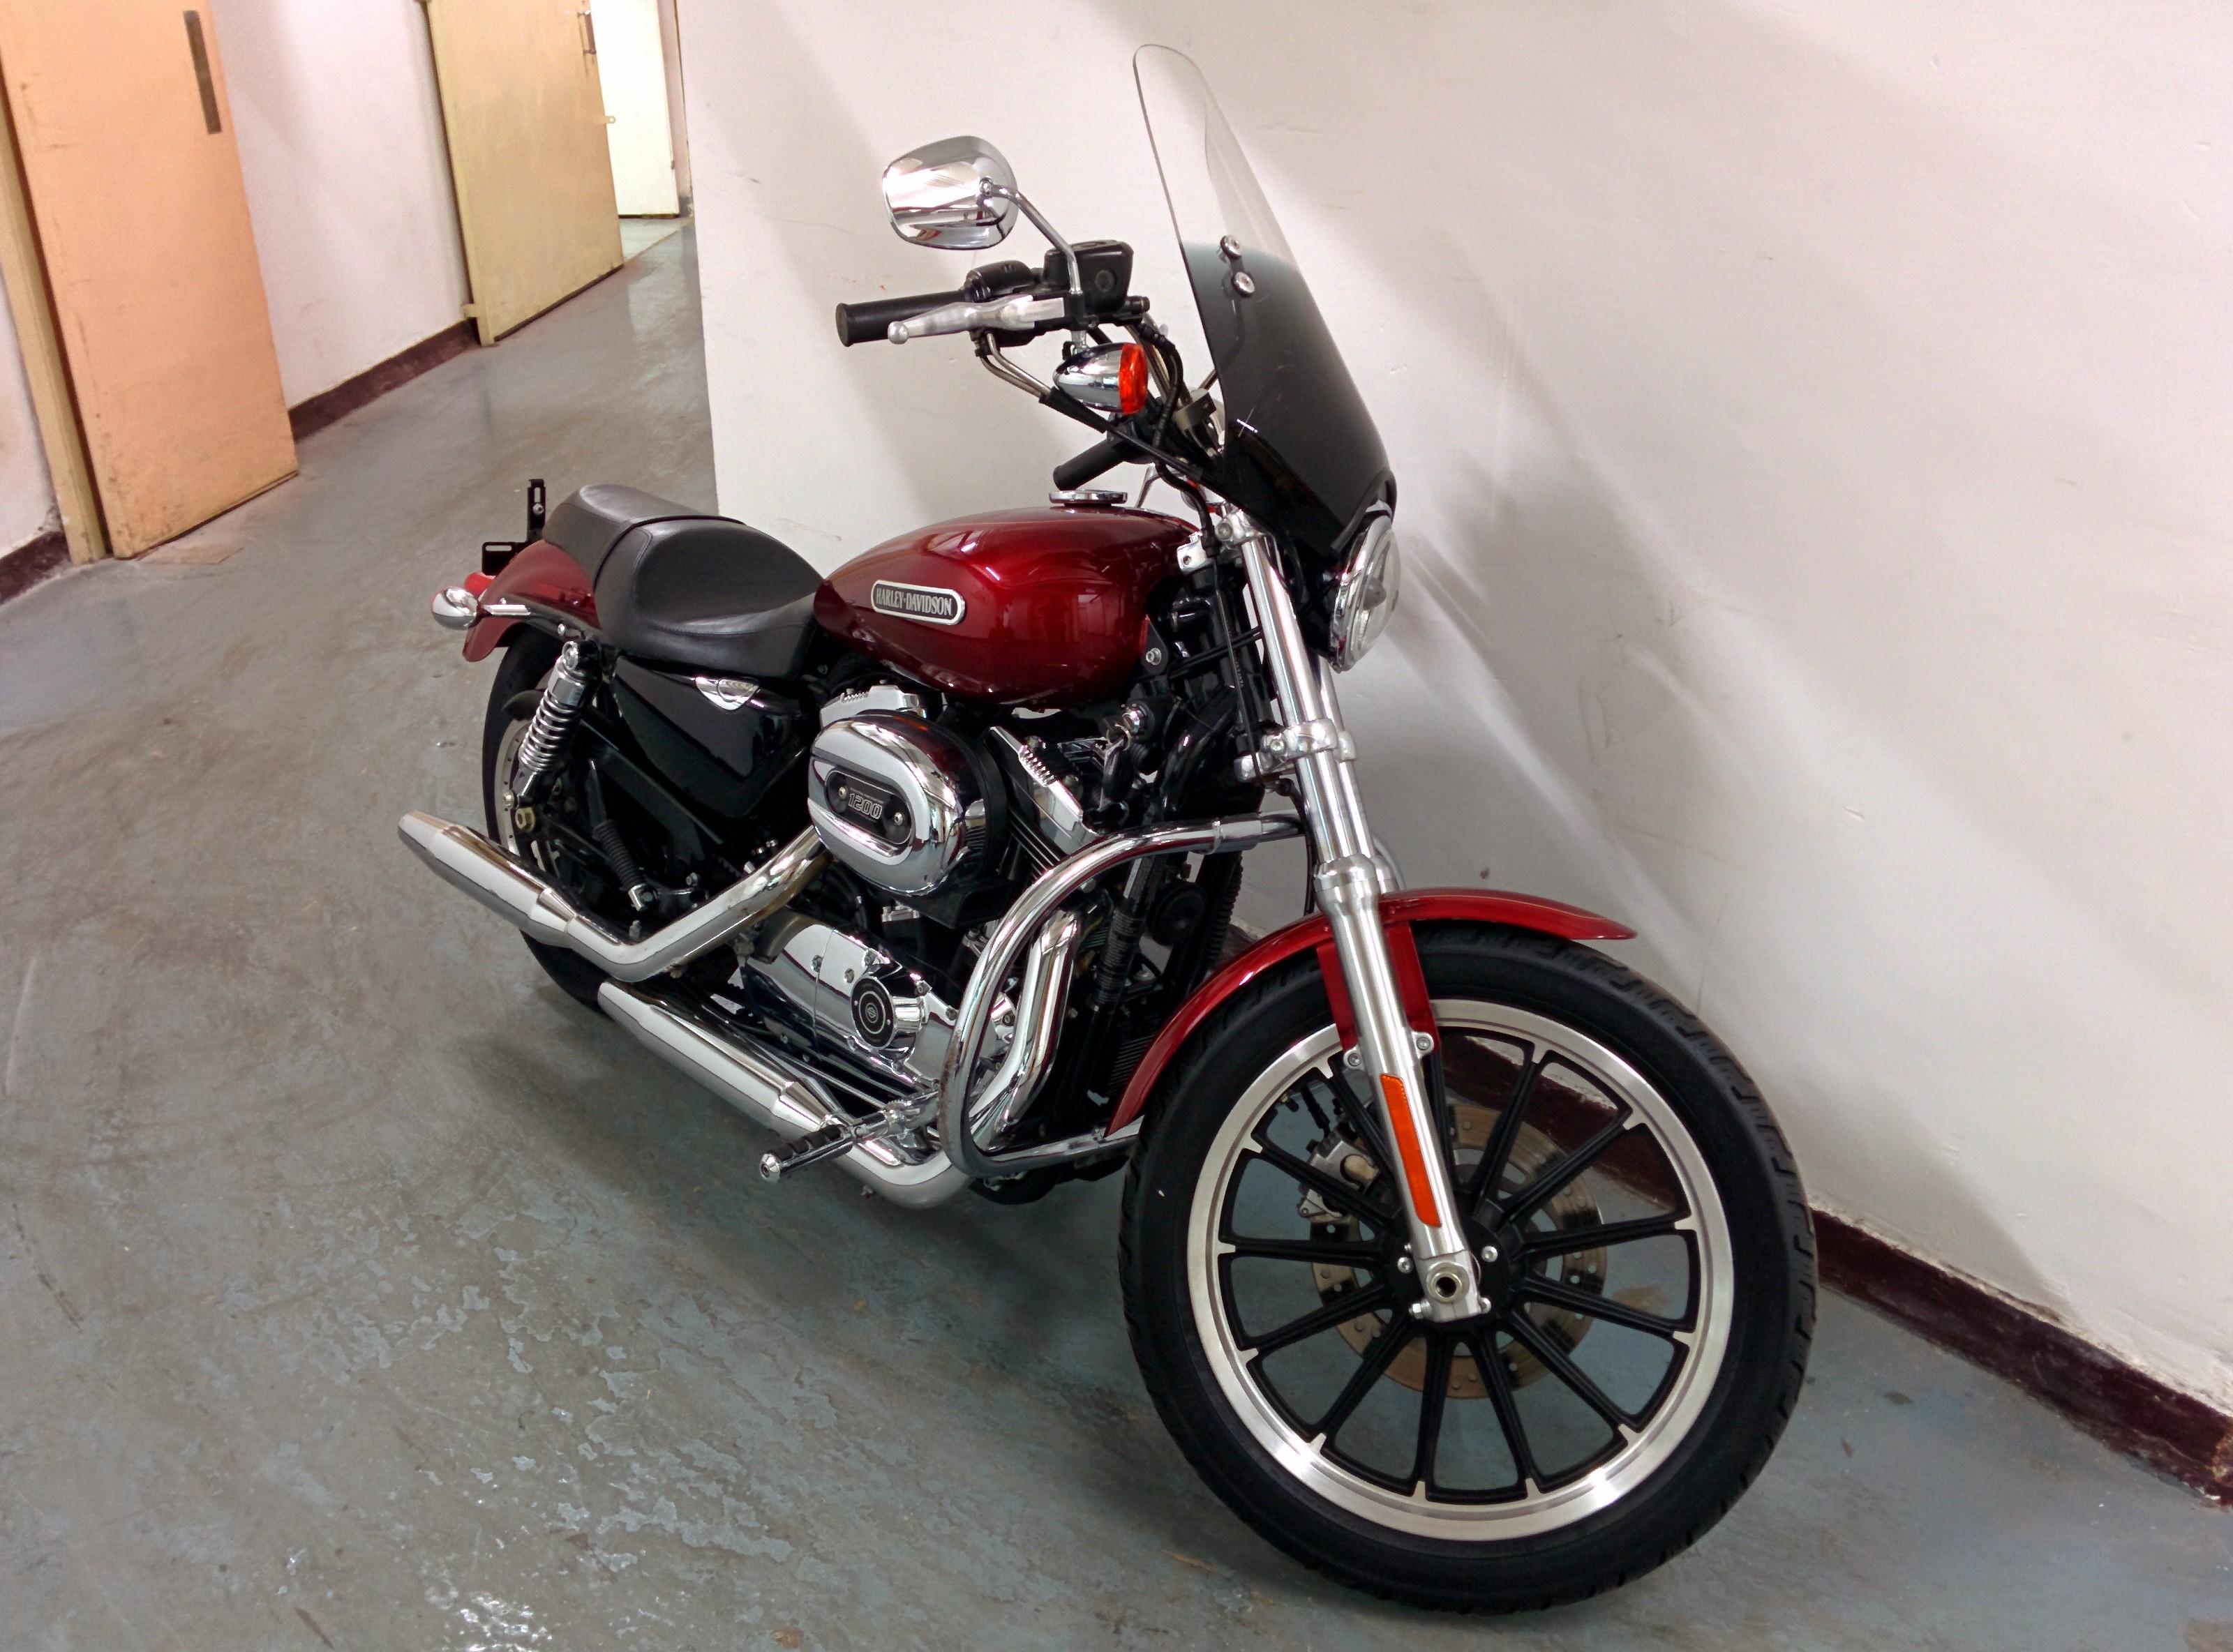 2009 Harley Davidson Xl1200l Sportster 1200 Low Motion